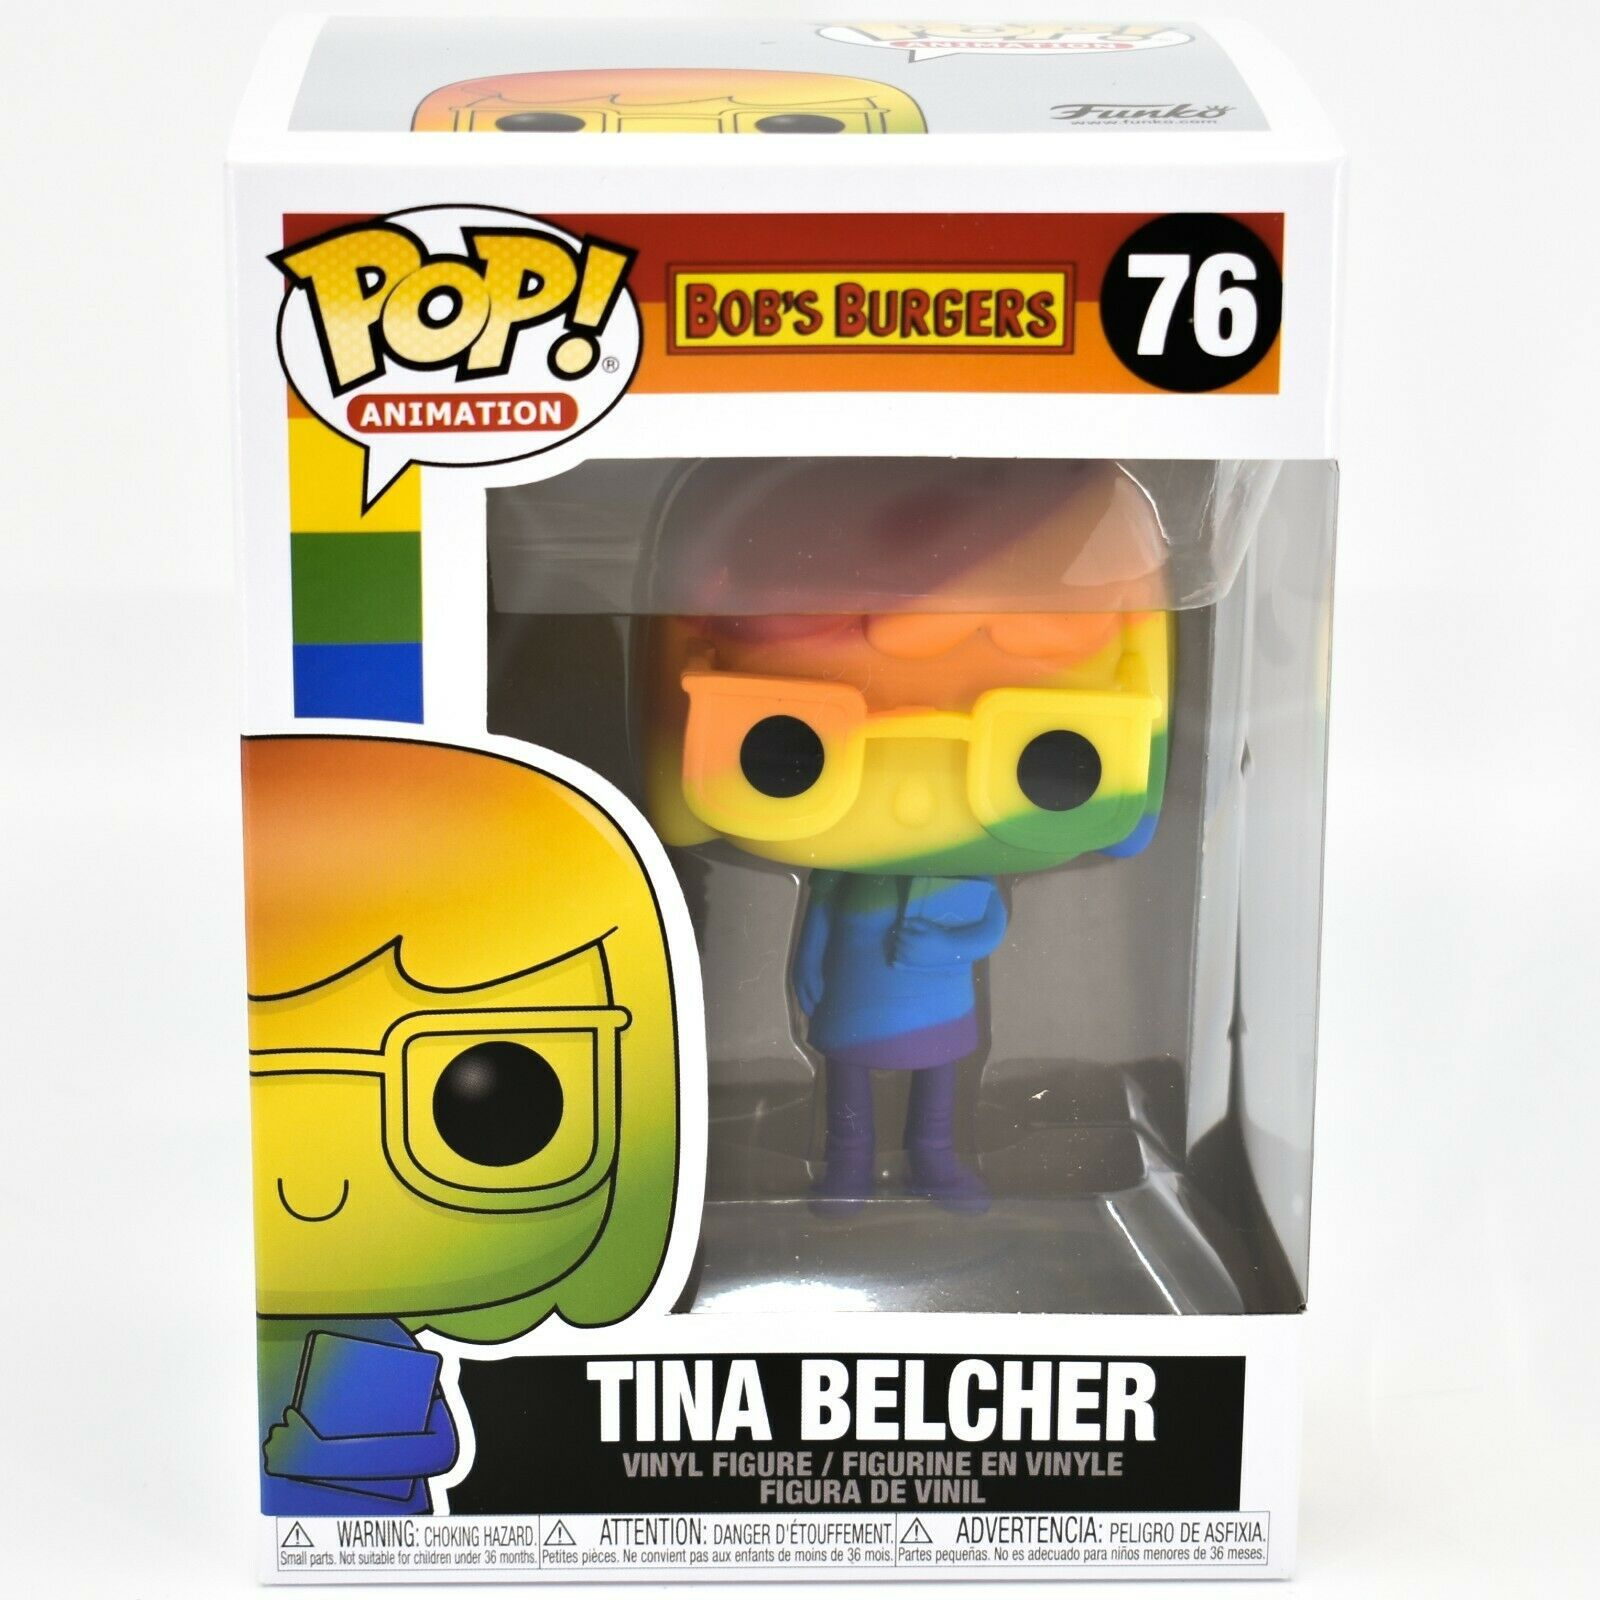 Funko Pop! Animation Bob's Burgers Pride 2021 Rainbow Tina Belcher #76 Figure